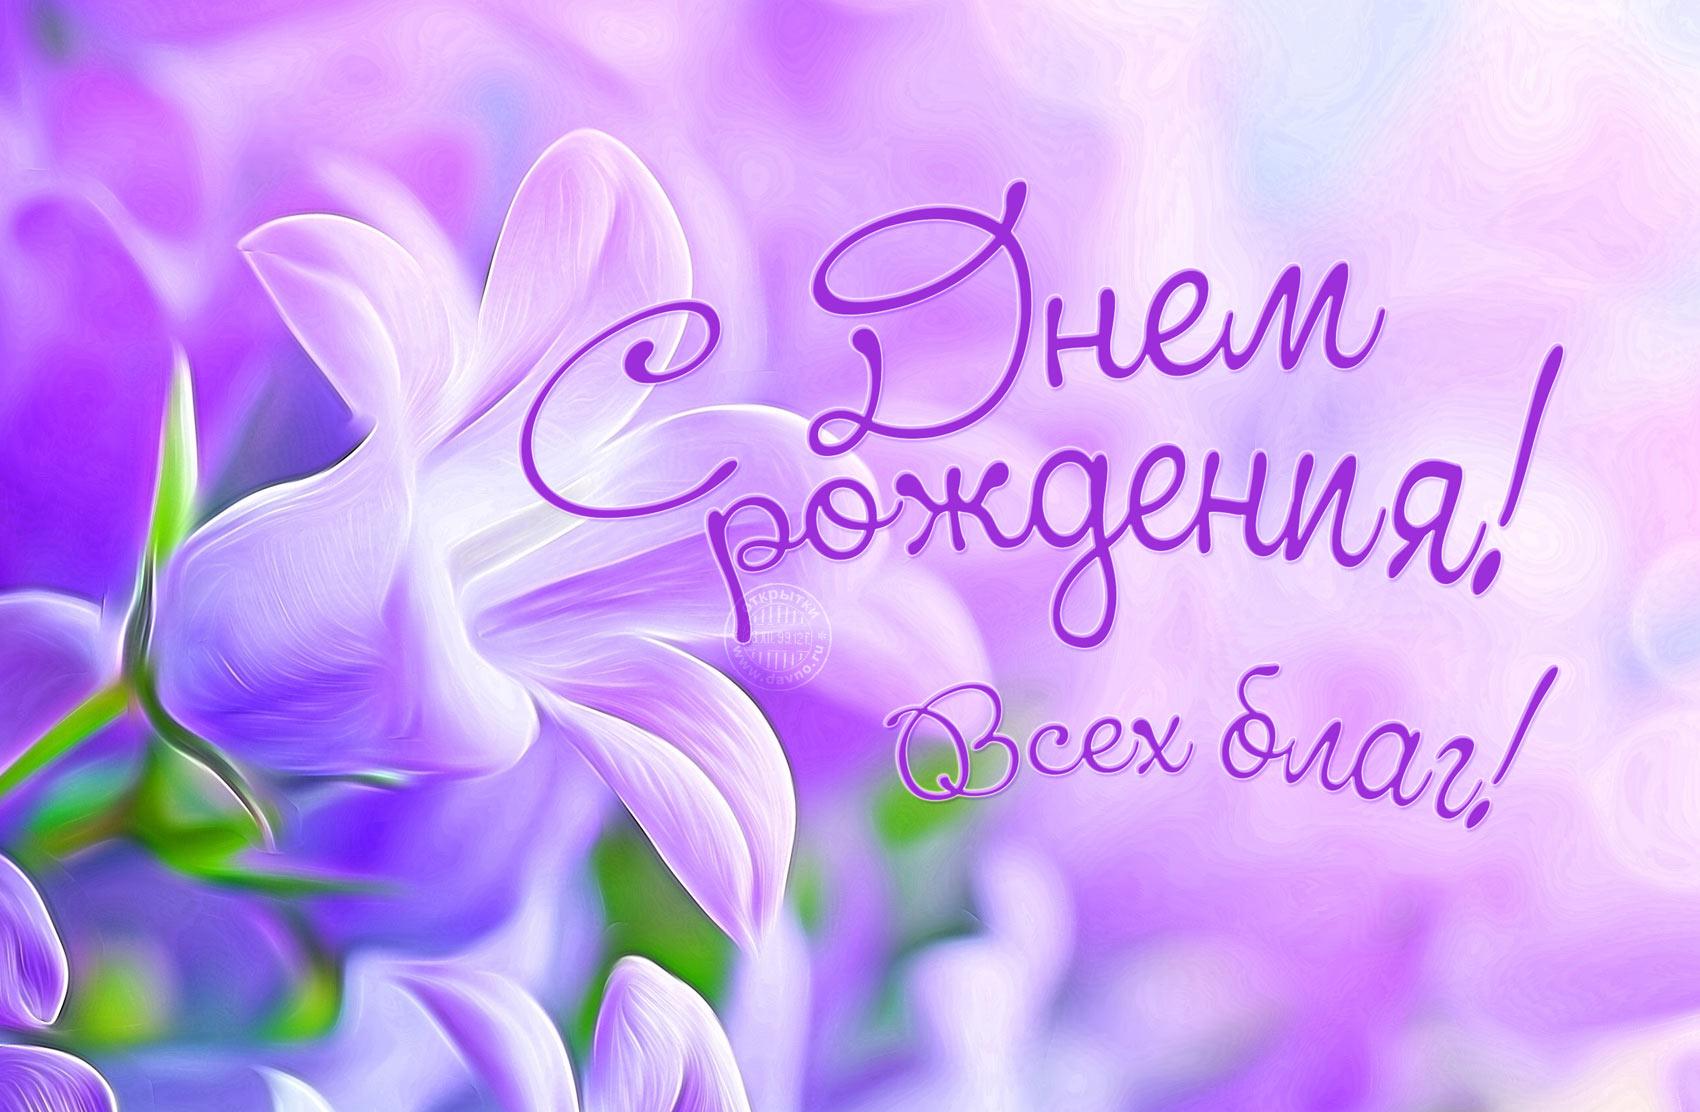 http://zheltaya.ru/wp-content/uploads/birthday-8251.jpg